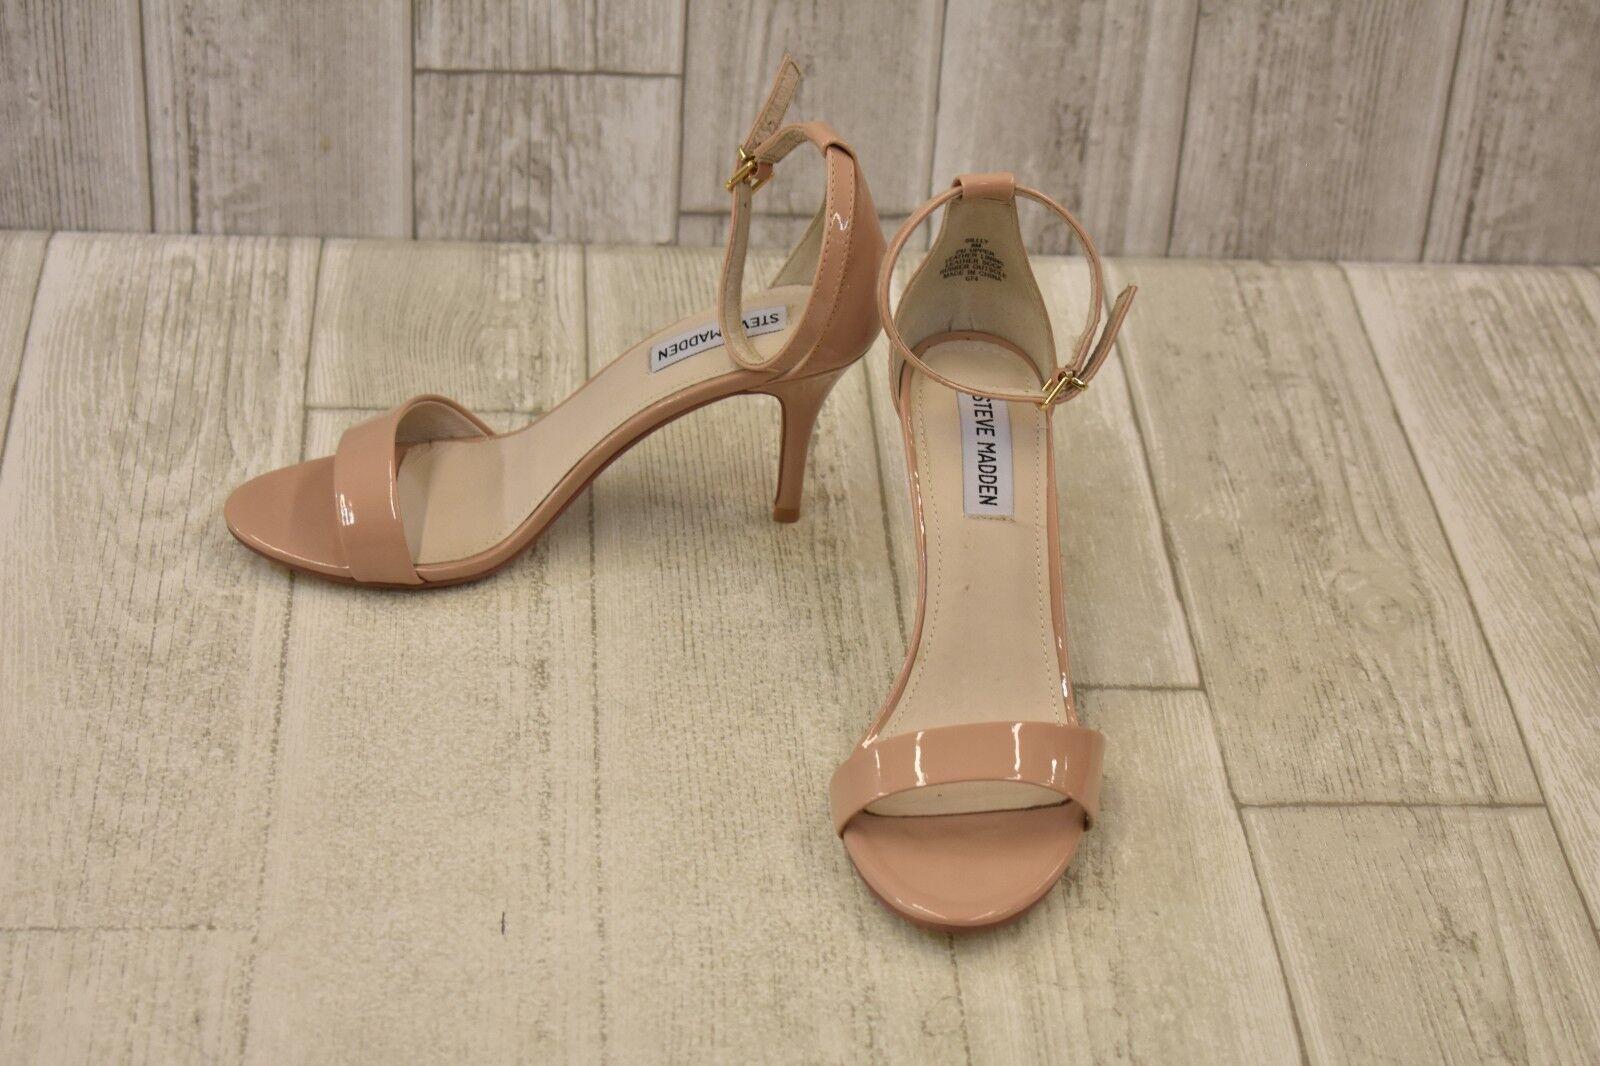 Steve Madden Exclusive - Sillly Sandal, Women's Size 8 M, bluesh